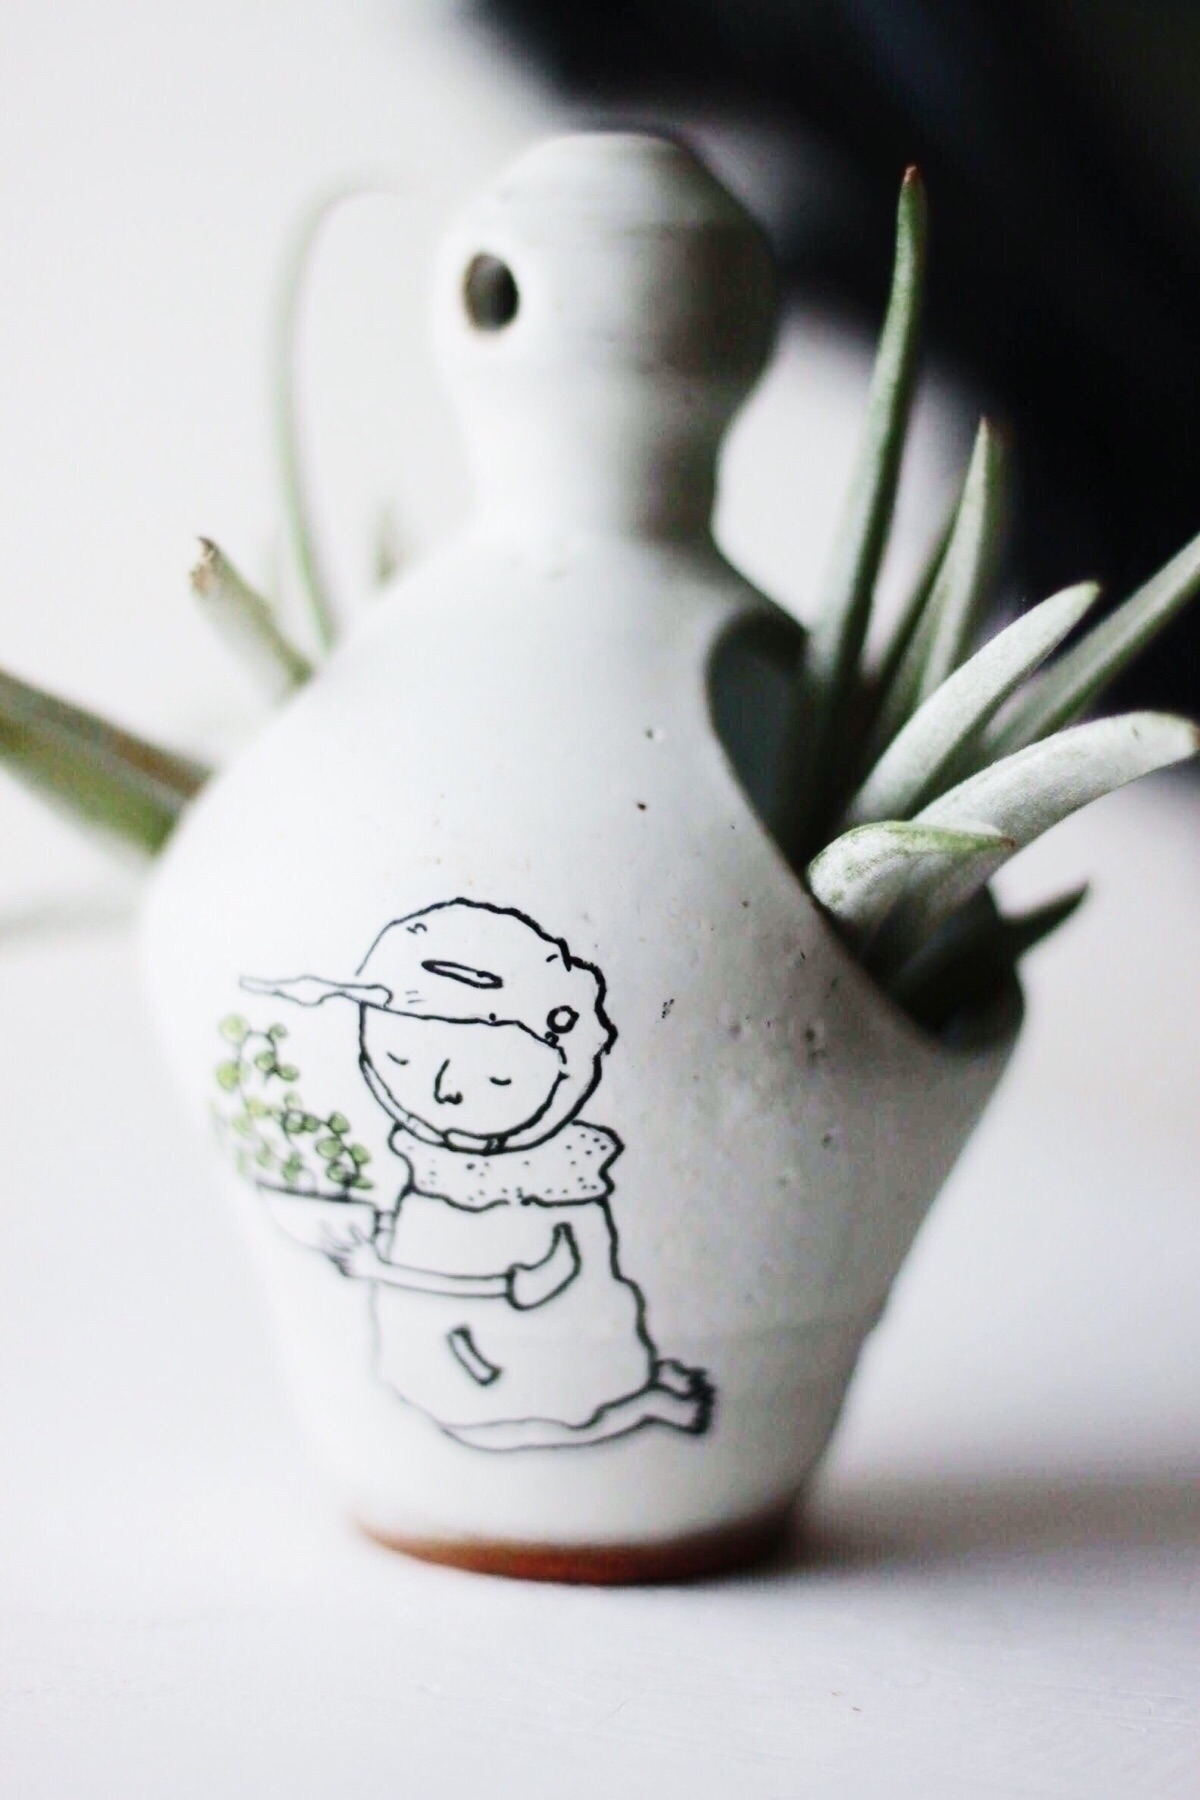 Ello! Giveaway time! Congrats W - chrisswazie-ceramics   ello